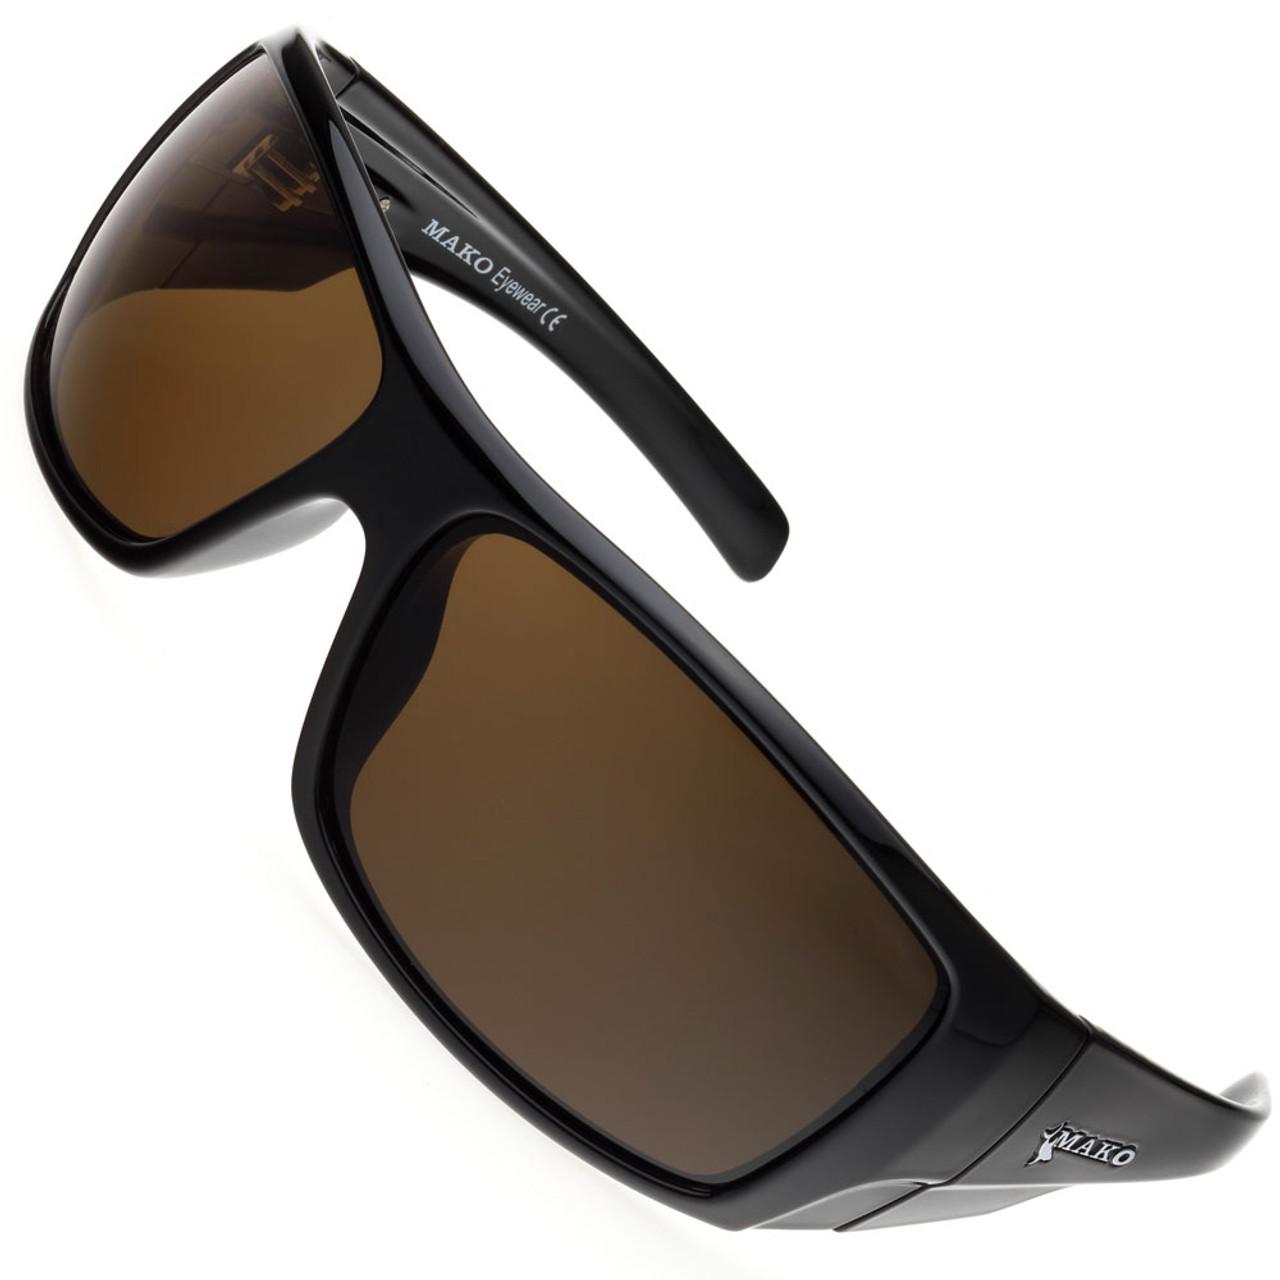 c217e56e51e Mako Indestructible Sunglasses · Mako Indestructible Grey Lens · Mako  Indestructible Brown Lens